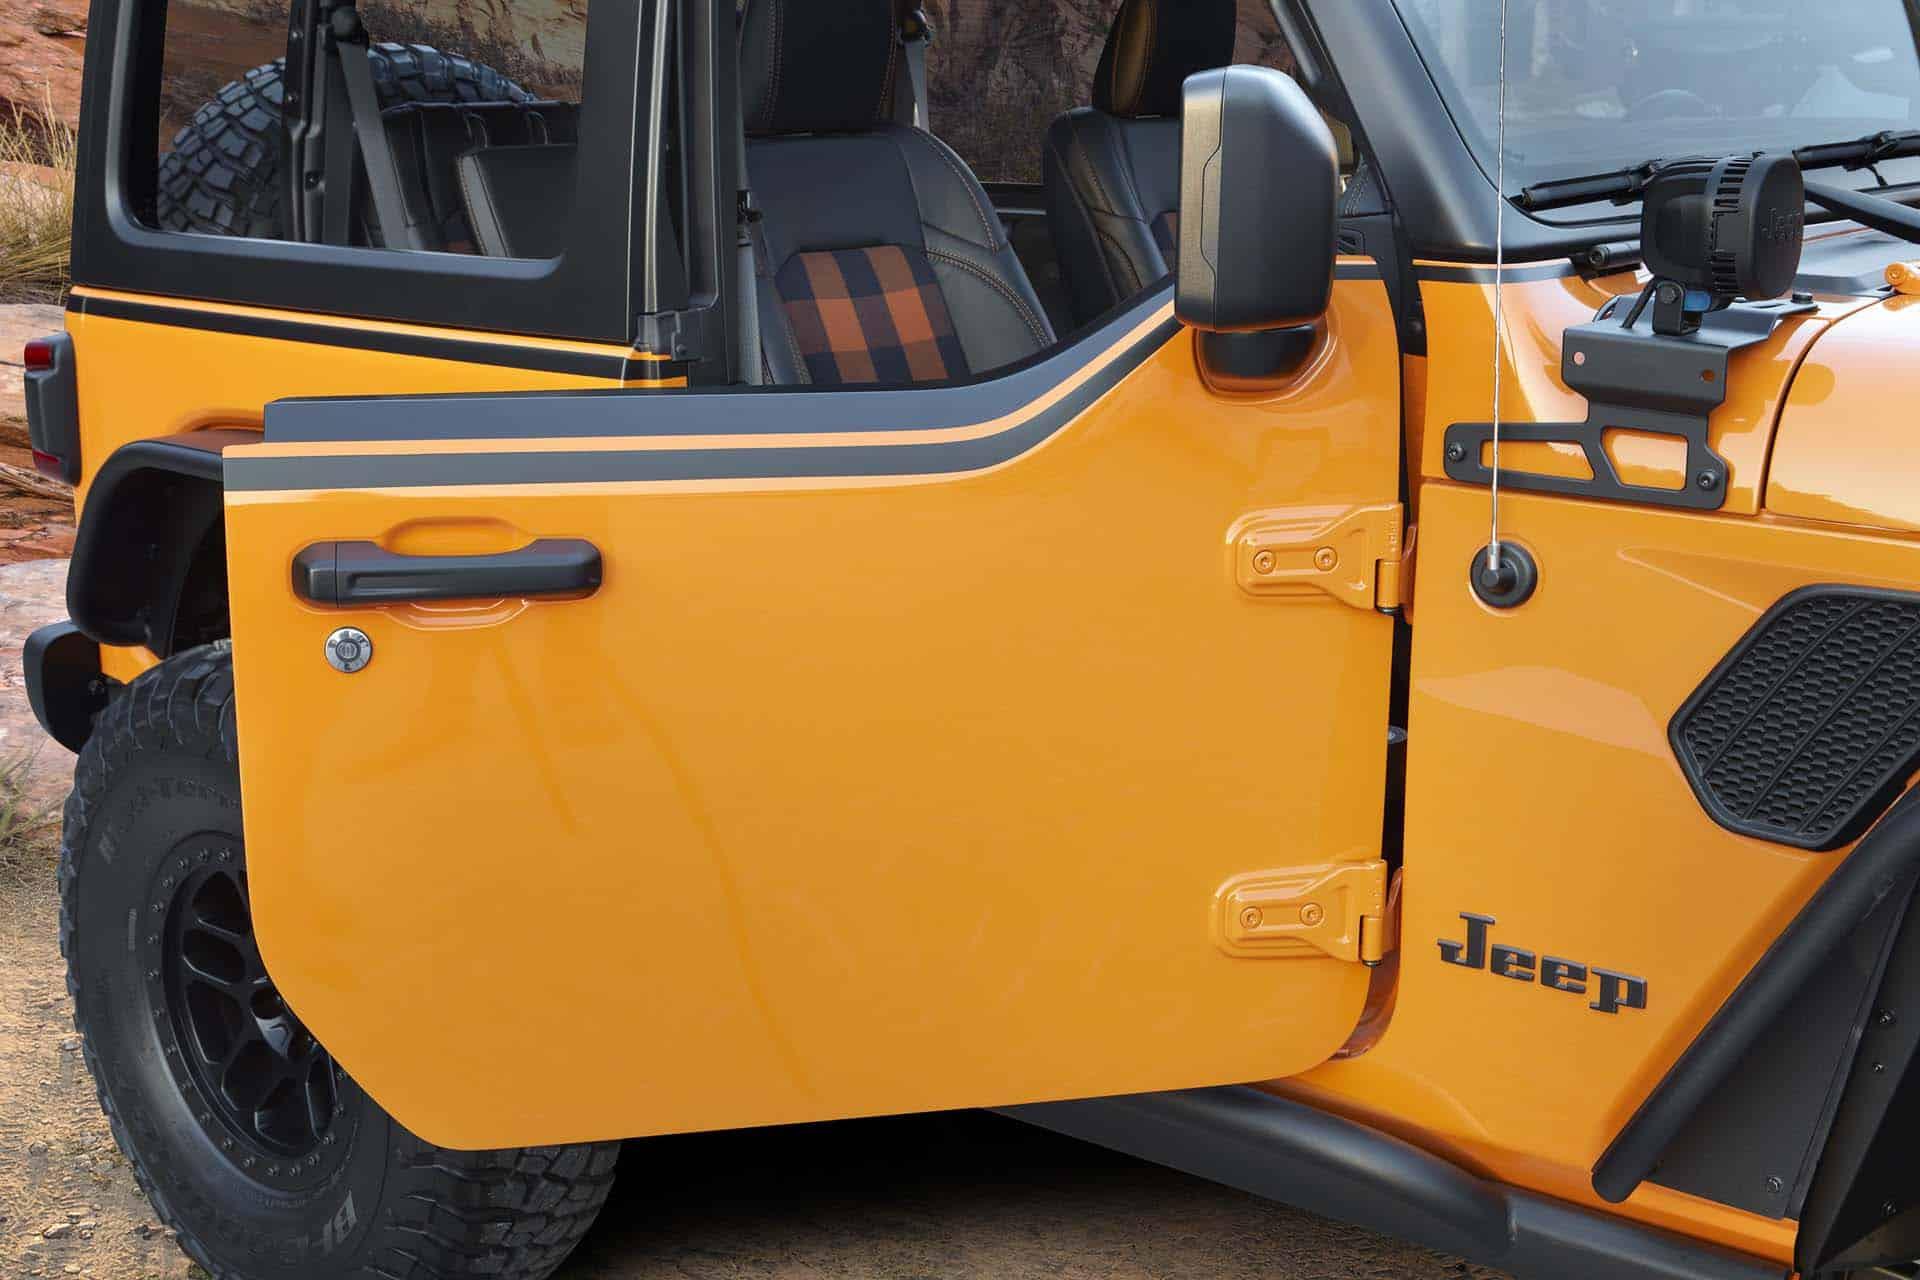 Electric Jeep Wrangler Magneto